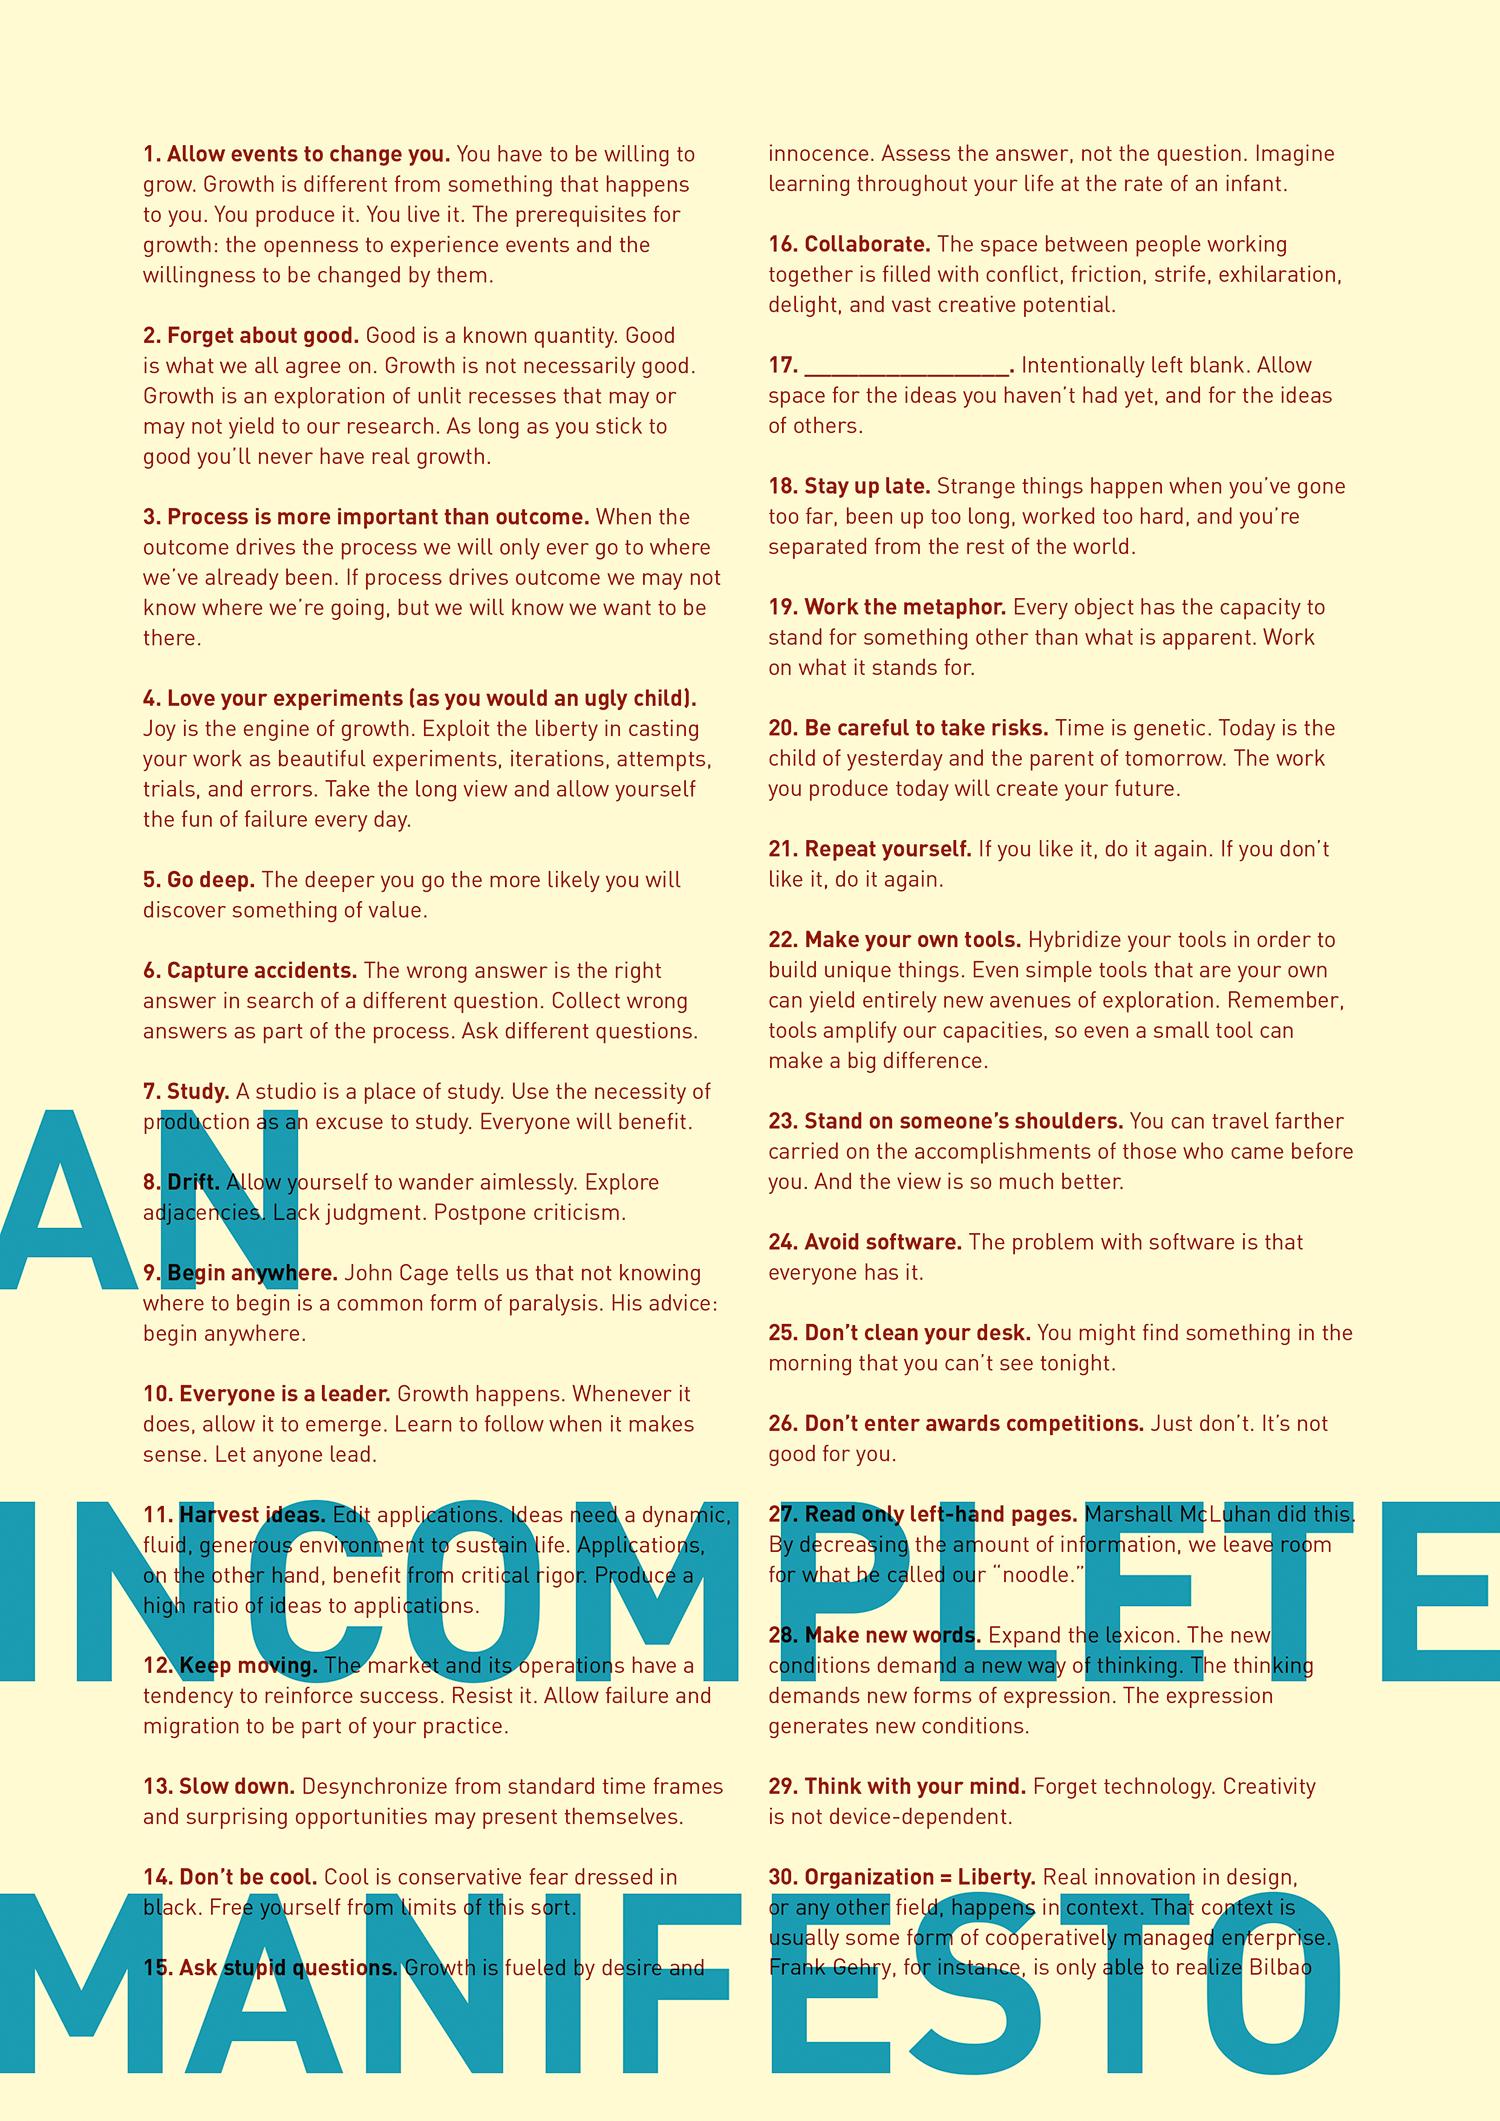 Incomplete Manifesto for Growth Bruce Mau_Kokonoma.pdf